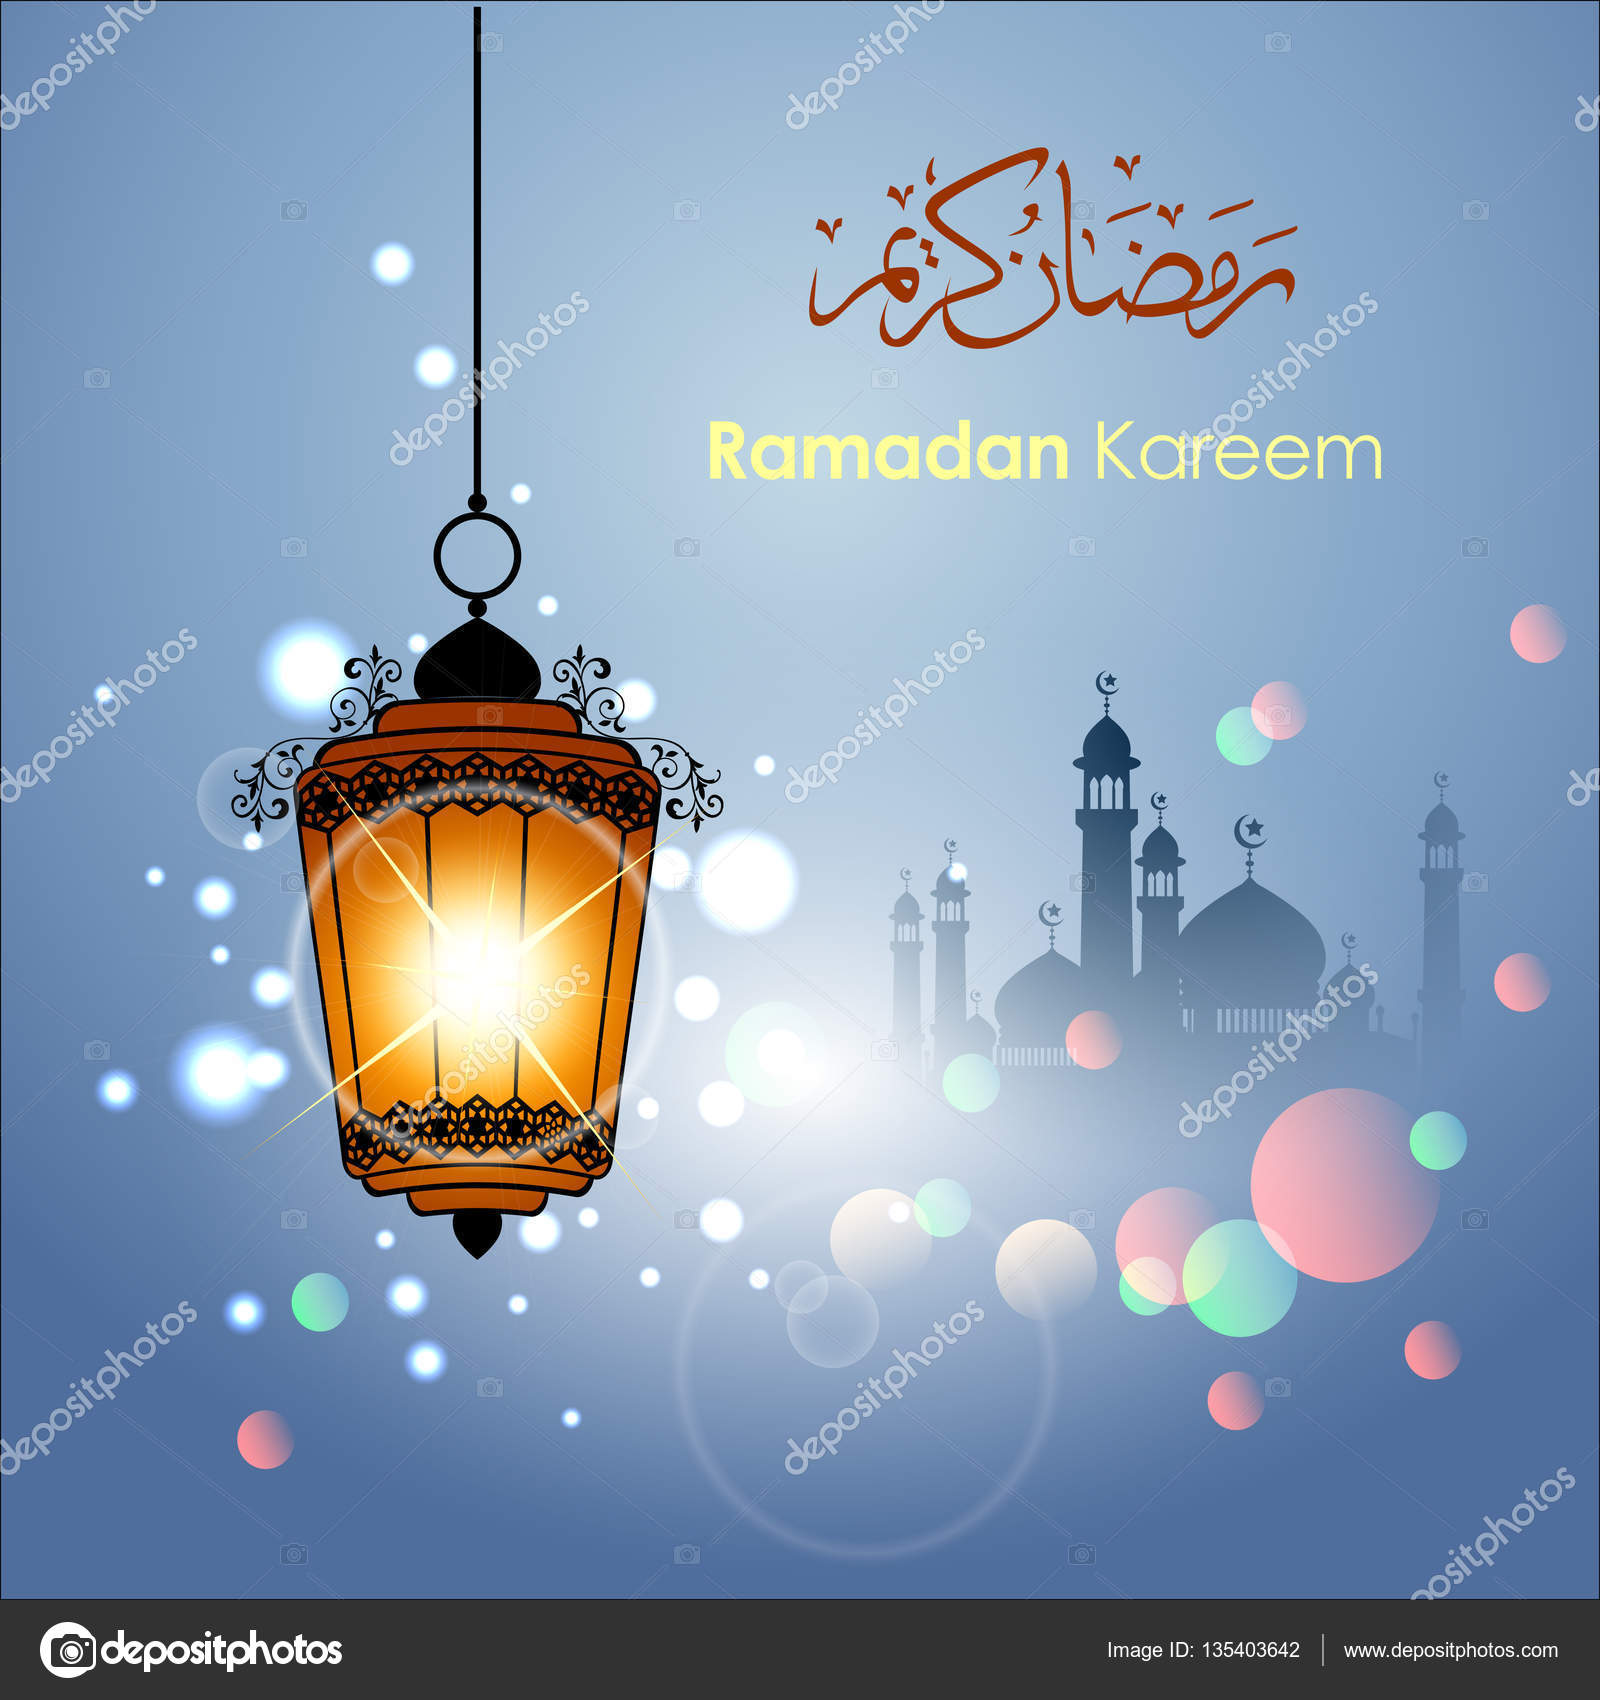 Ramadan greetings in arabic script stock vector legendofsinbatt ramadan greetings in arabic script stock vector m4hsunfo